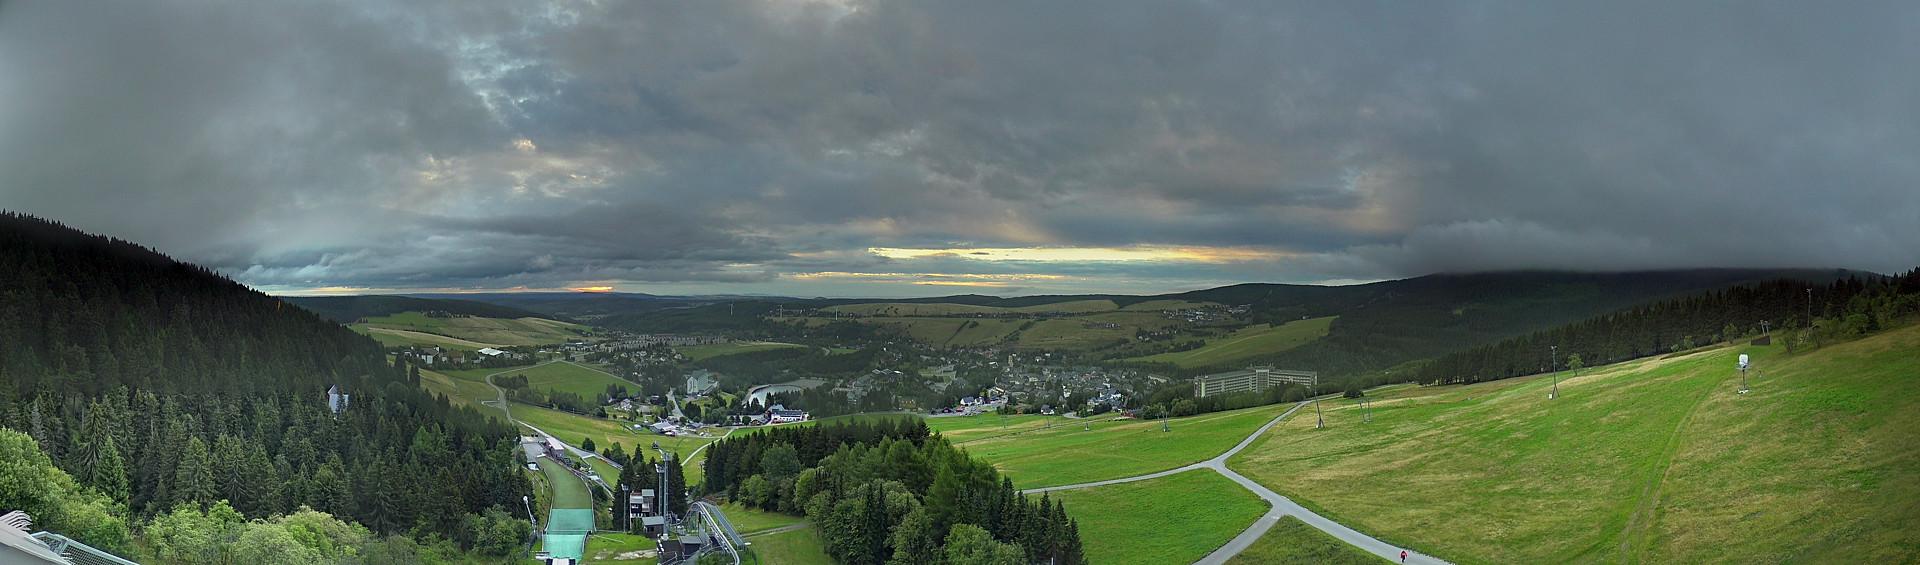 Fichtelberg - Oberwiesenthal panorama webcam